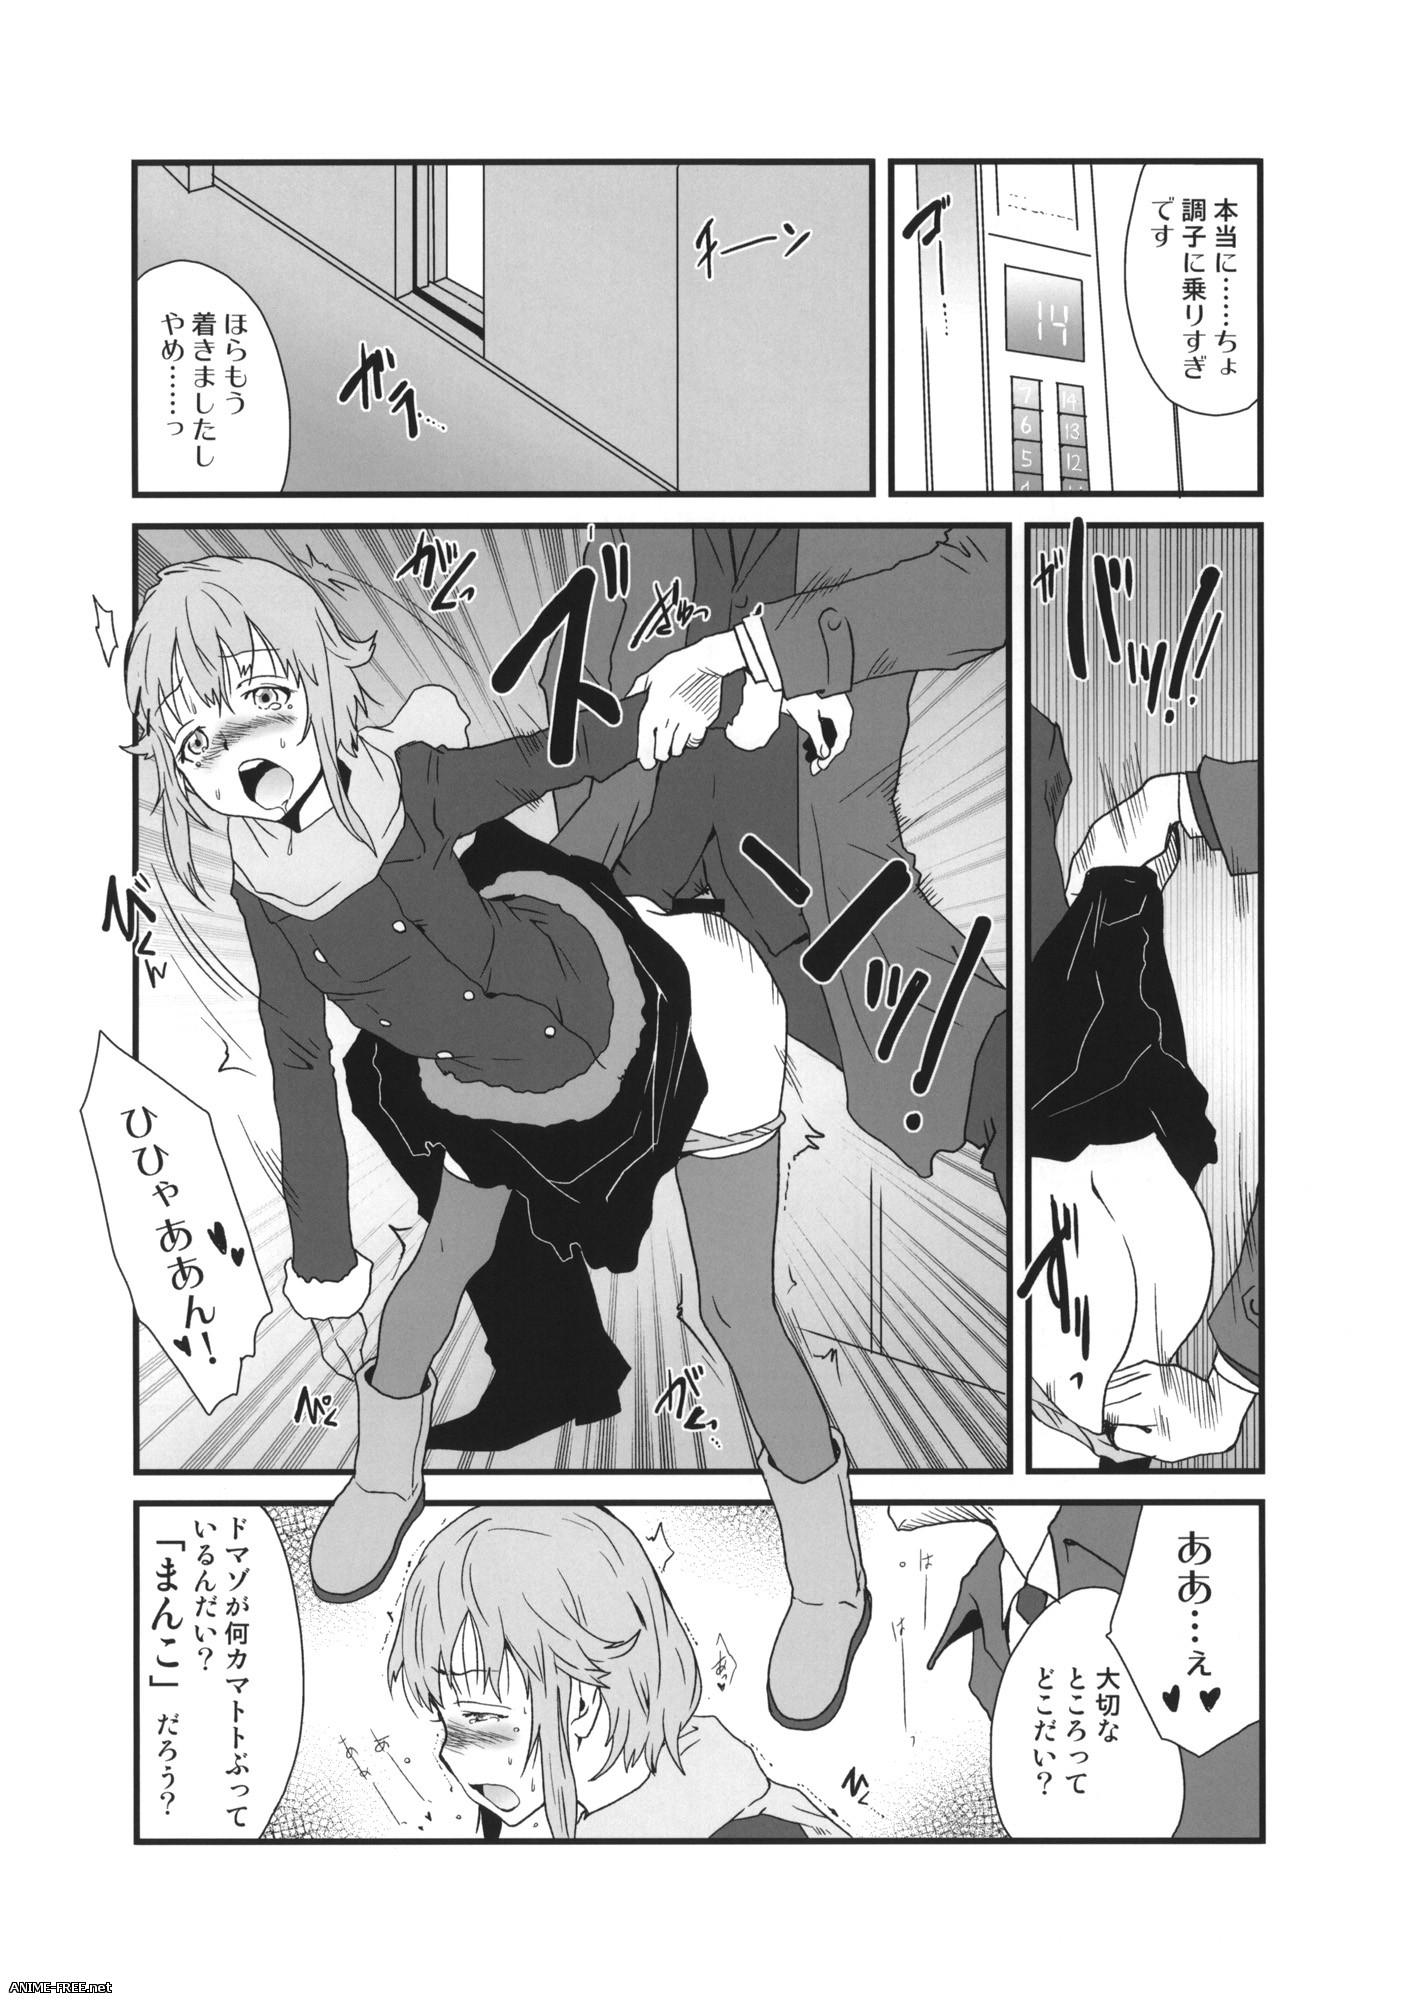 Tamaoki Benkyo / Tamaoki Benkyou / PORNOSTAR - Сборник хентай манги [Ptcen] [JAP,ENG,RUS] Manga Hentai